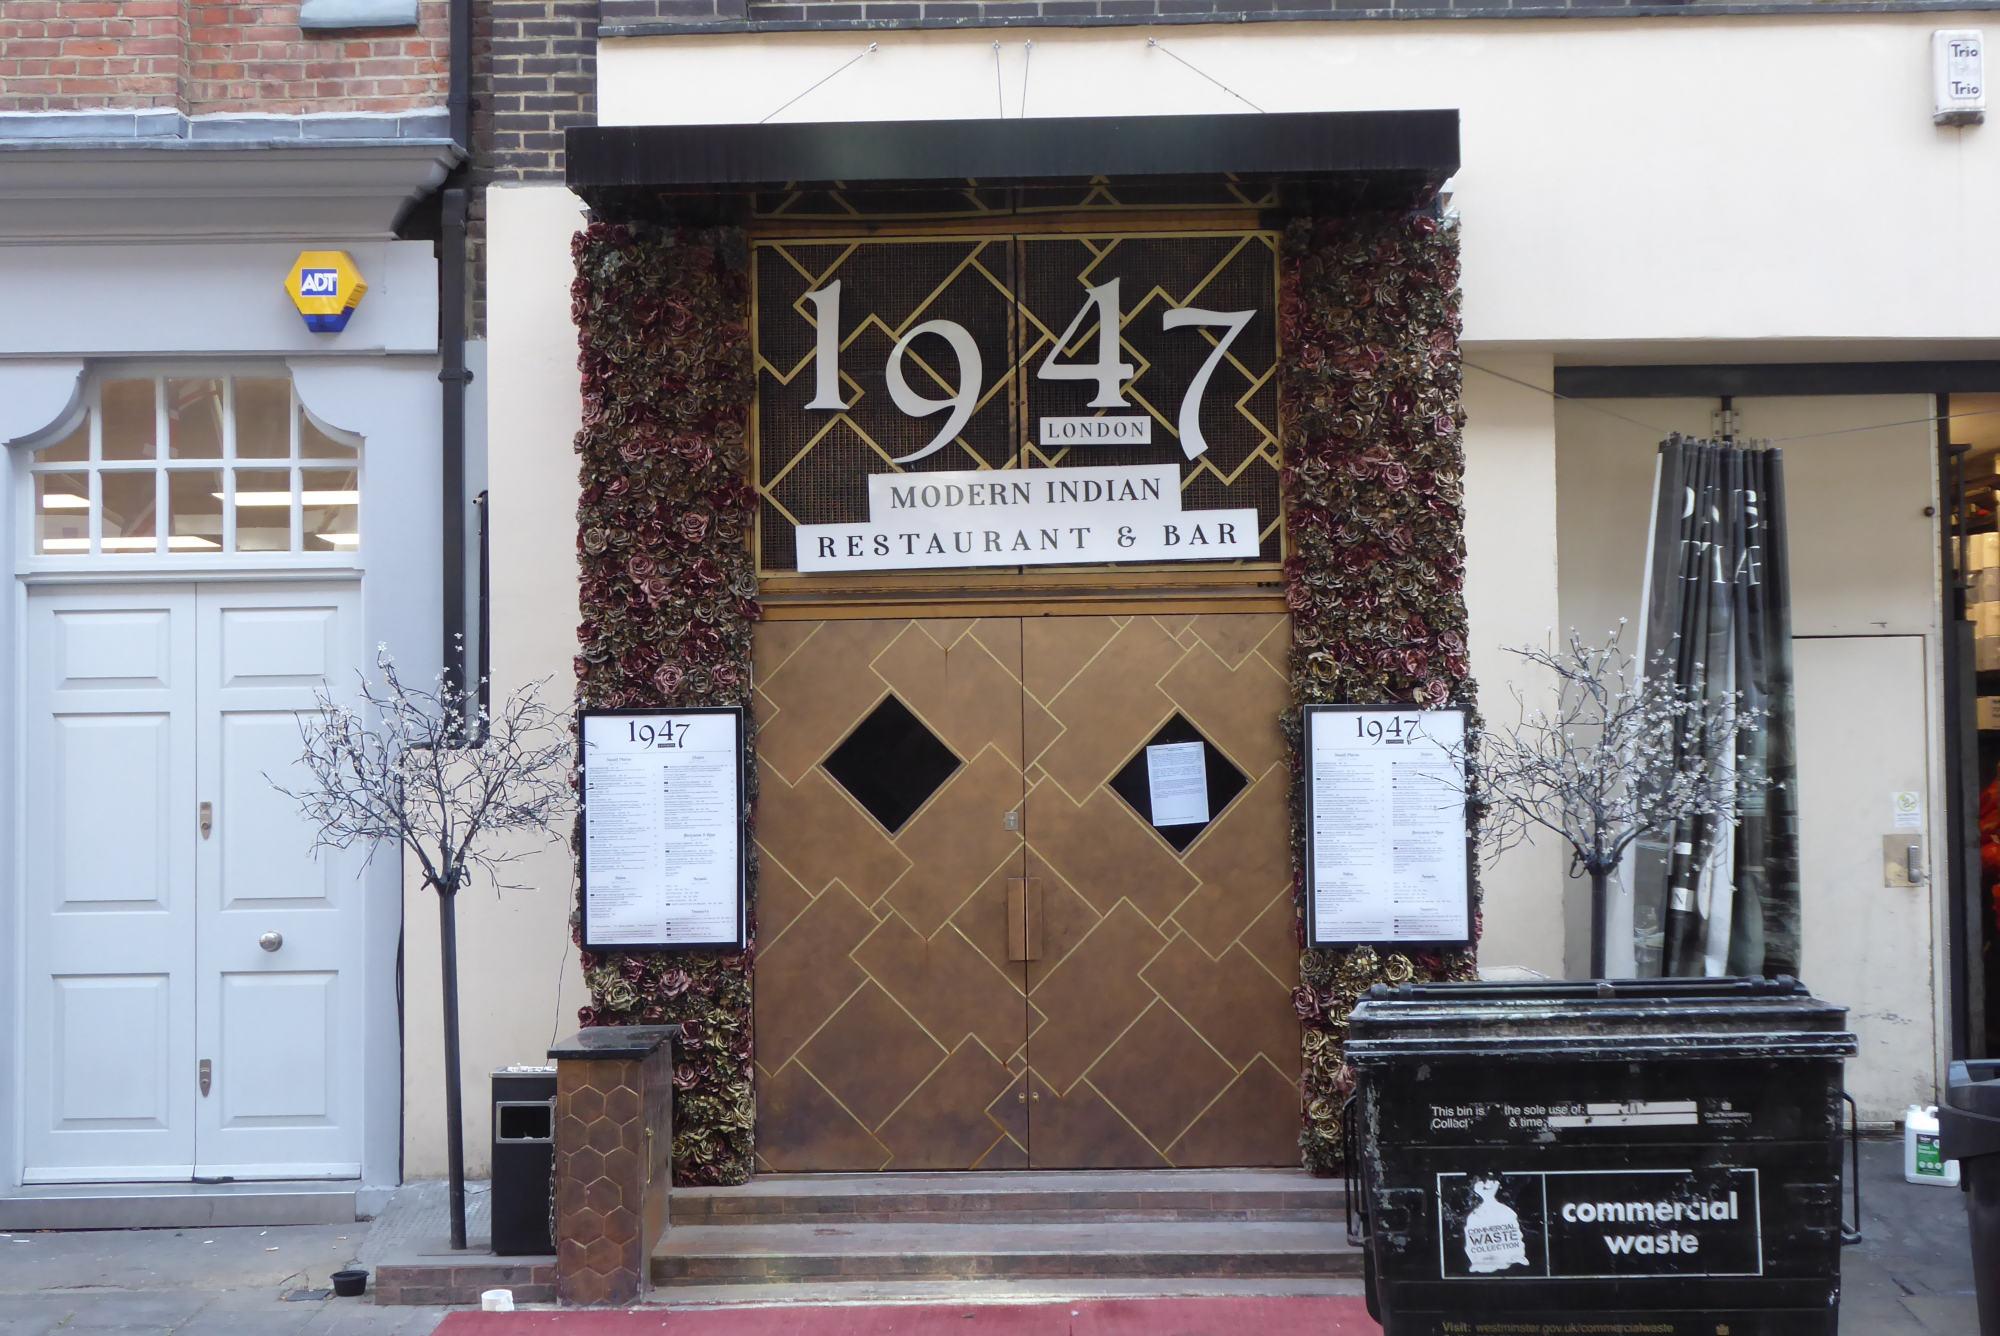 Entrance to restaurant in Rathbone Street.